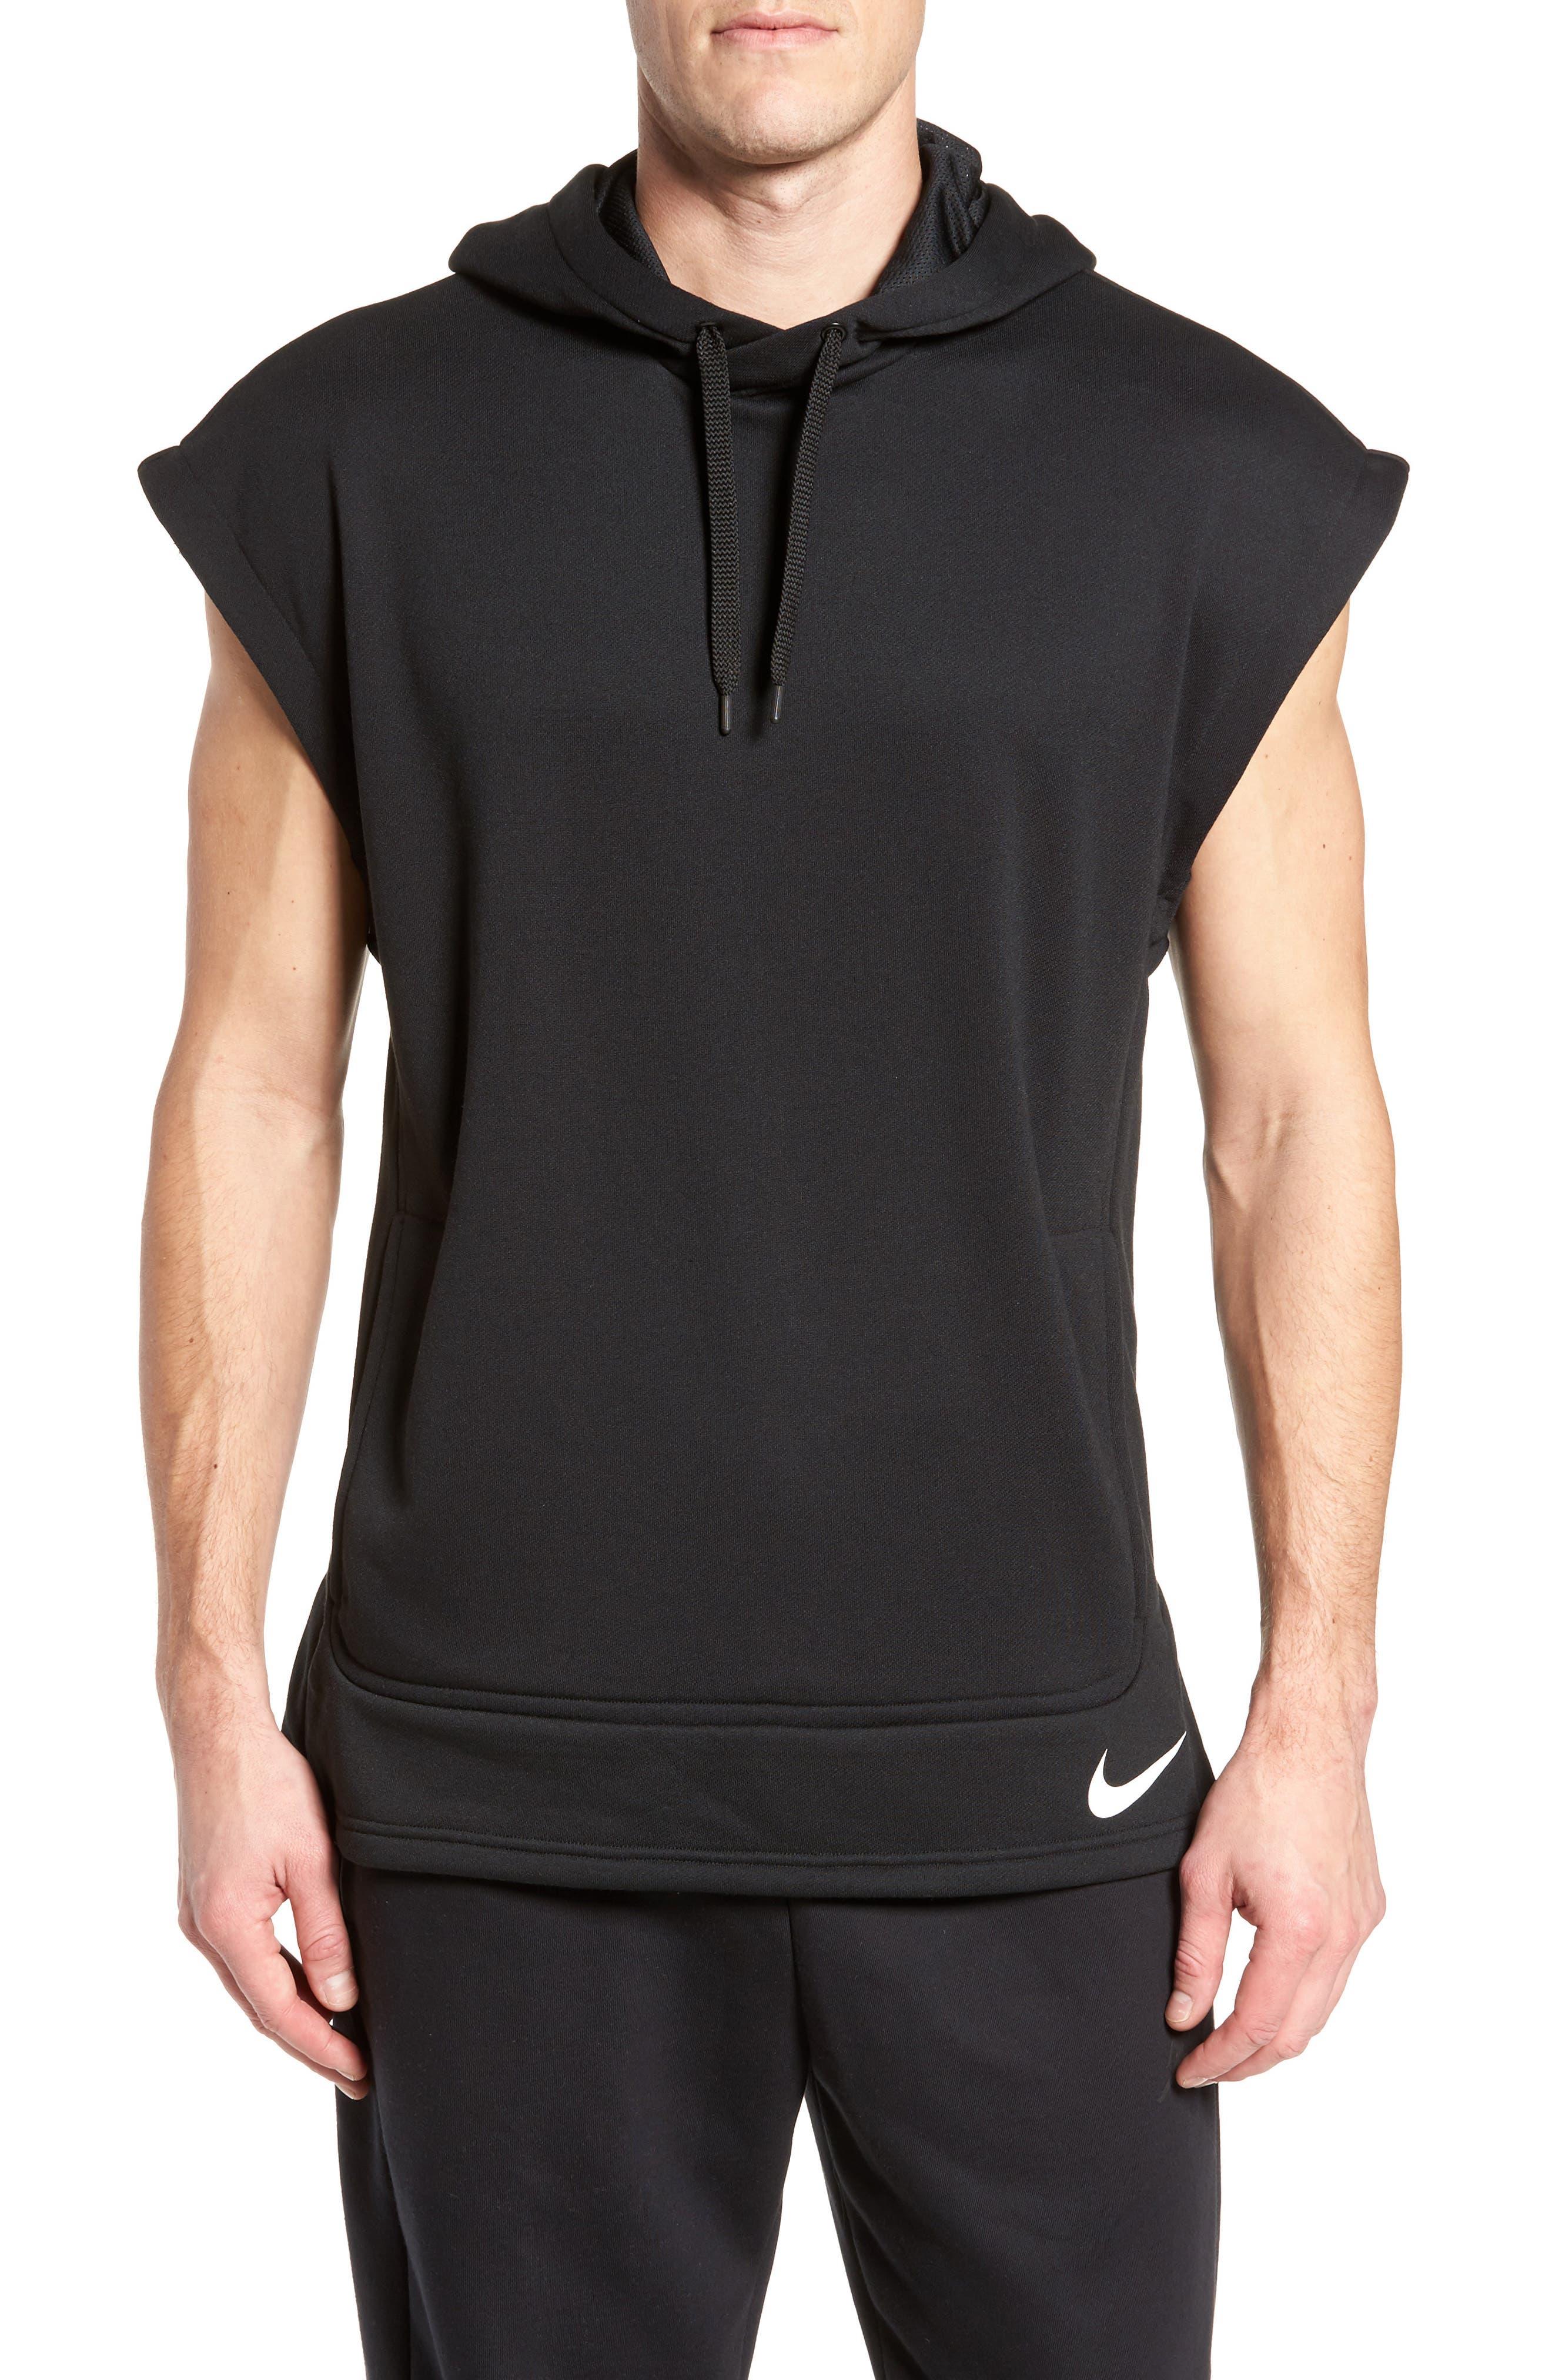 Nike Training Dry Top PX Sleeveless Hoodie (Men)